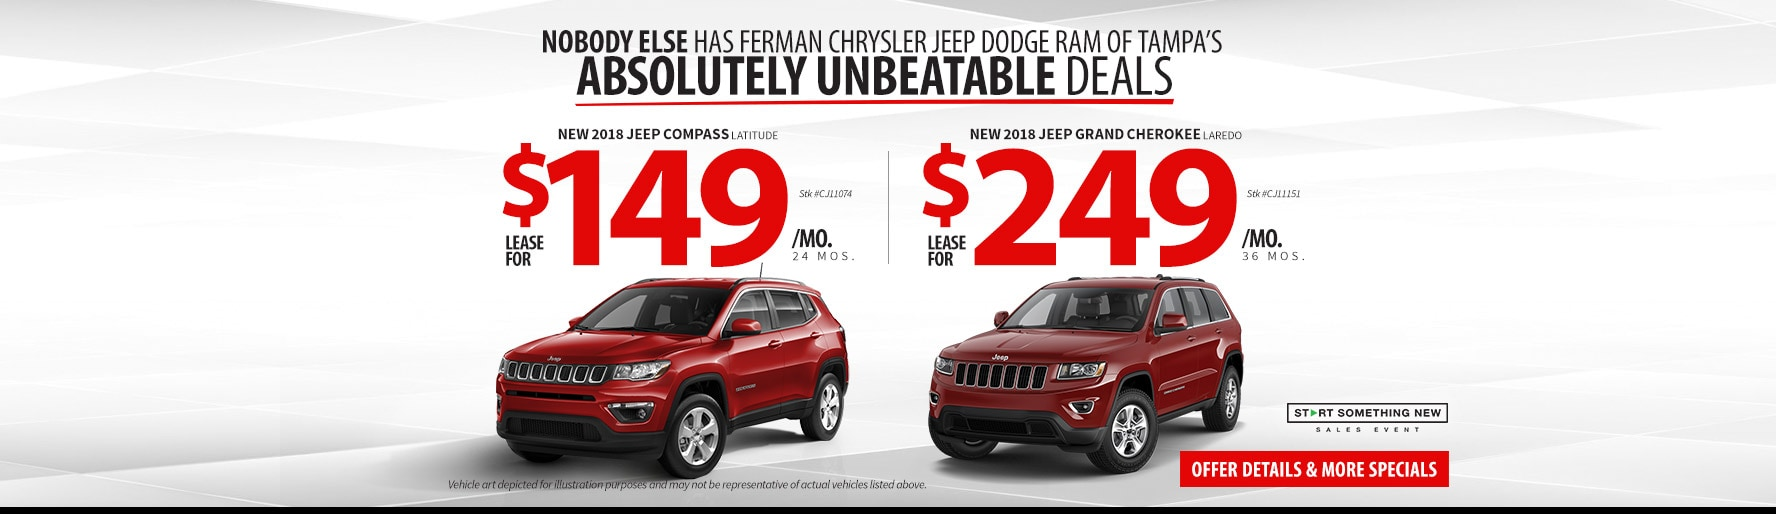 New 2017 2018 Chrysler Jeep Dodge Ram Amp Used Car